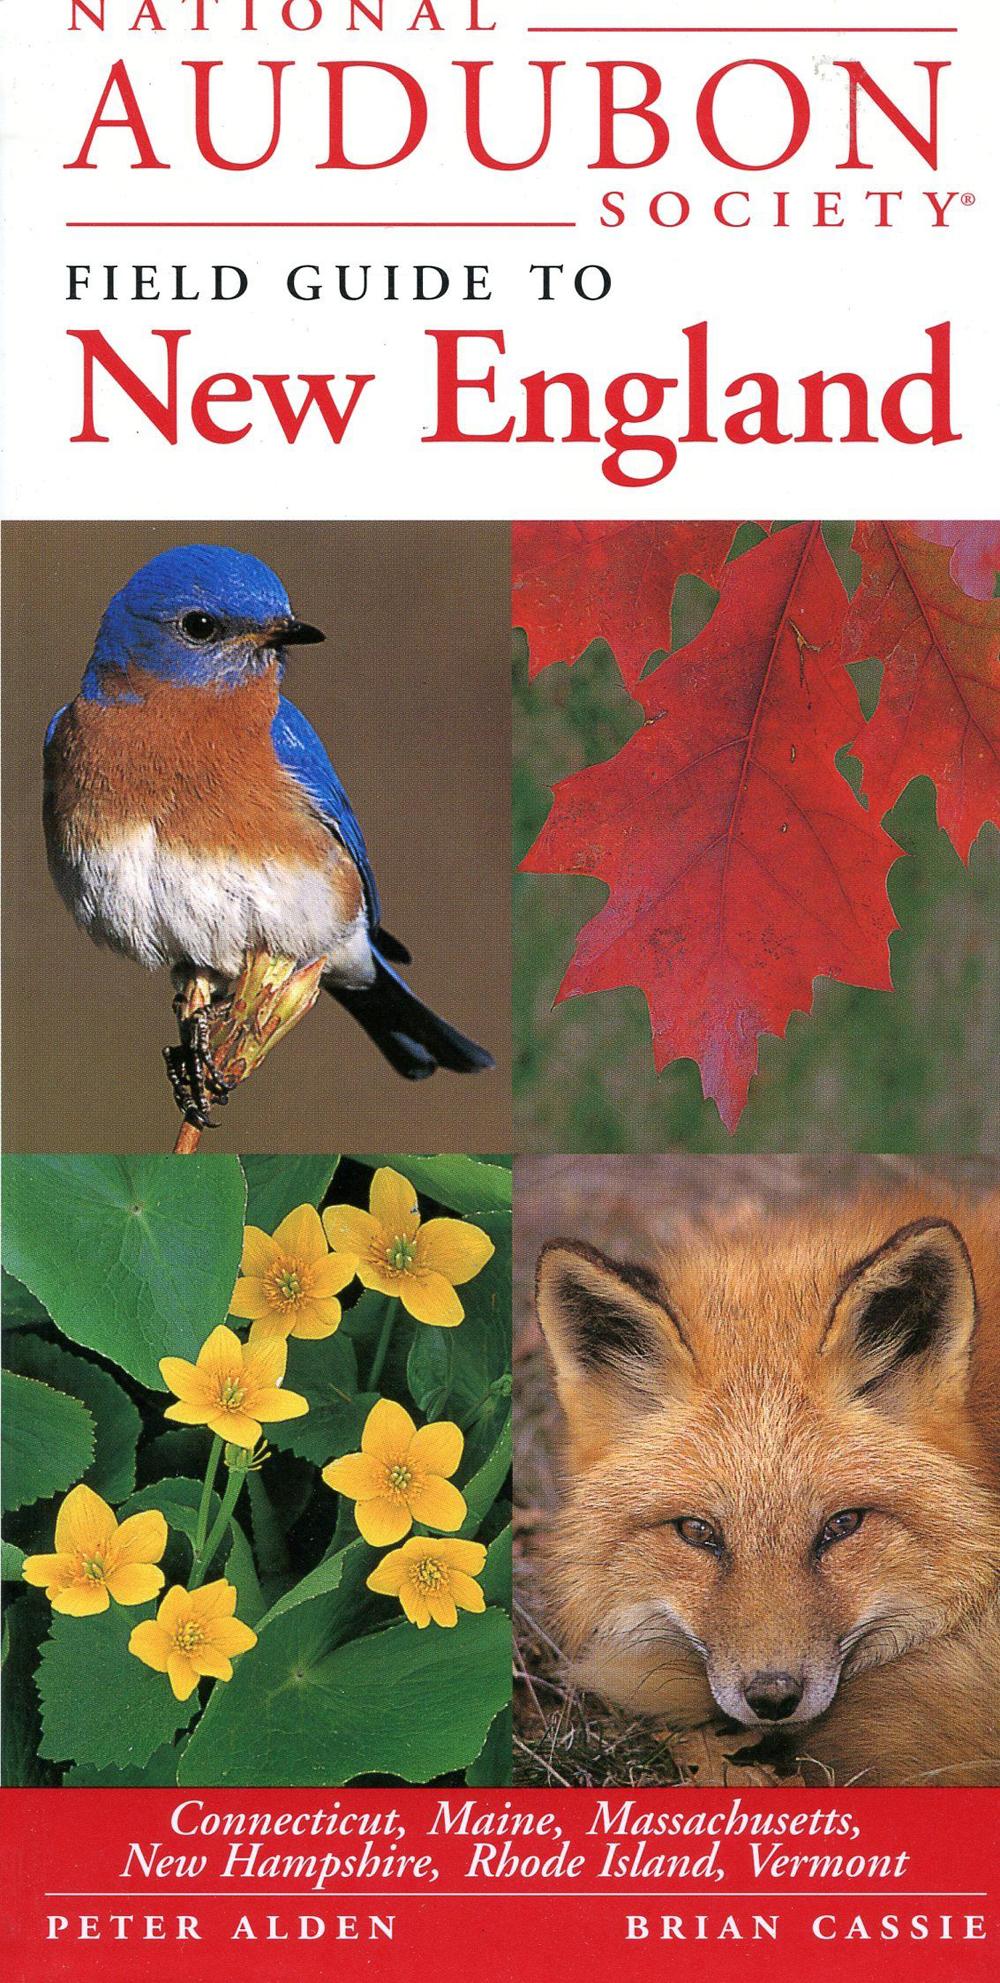 New England States (National Audubon Society® Regional Field Guide)